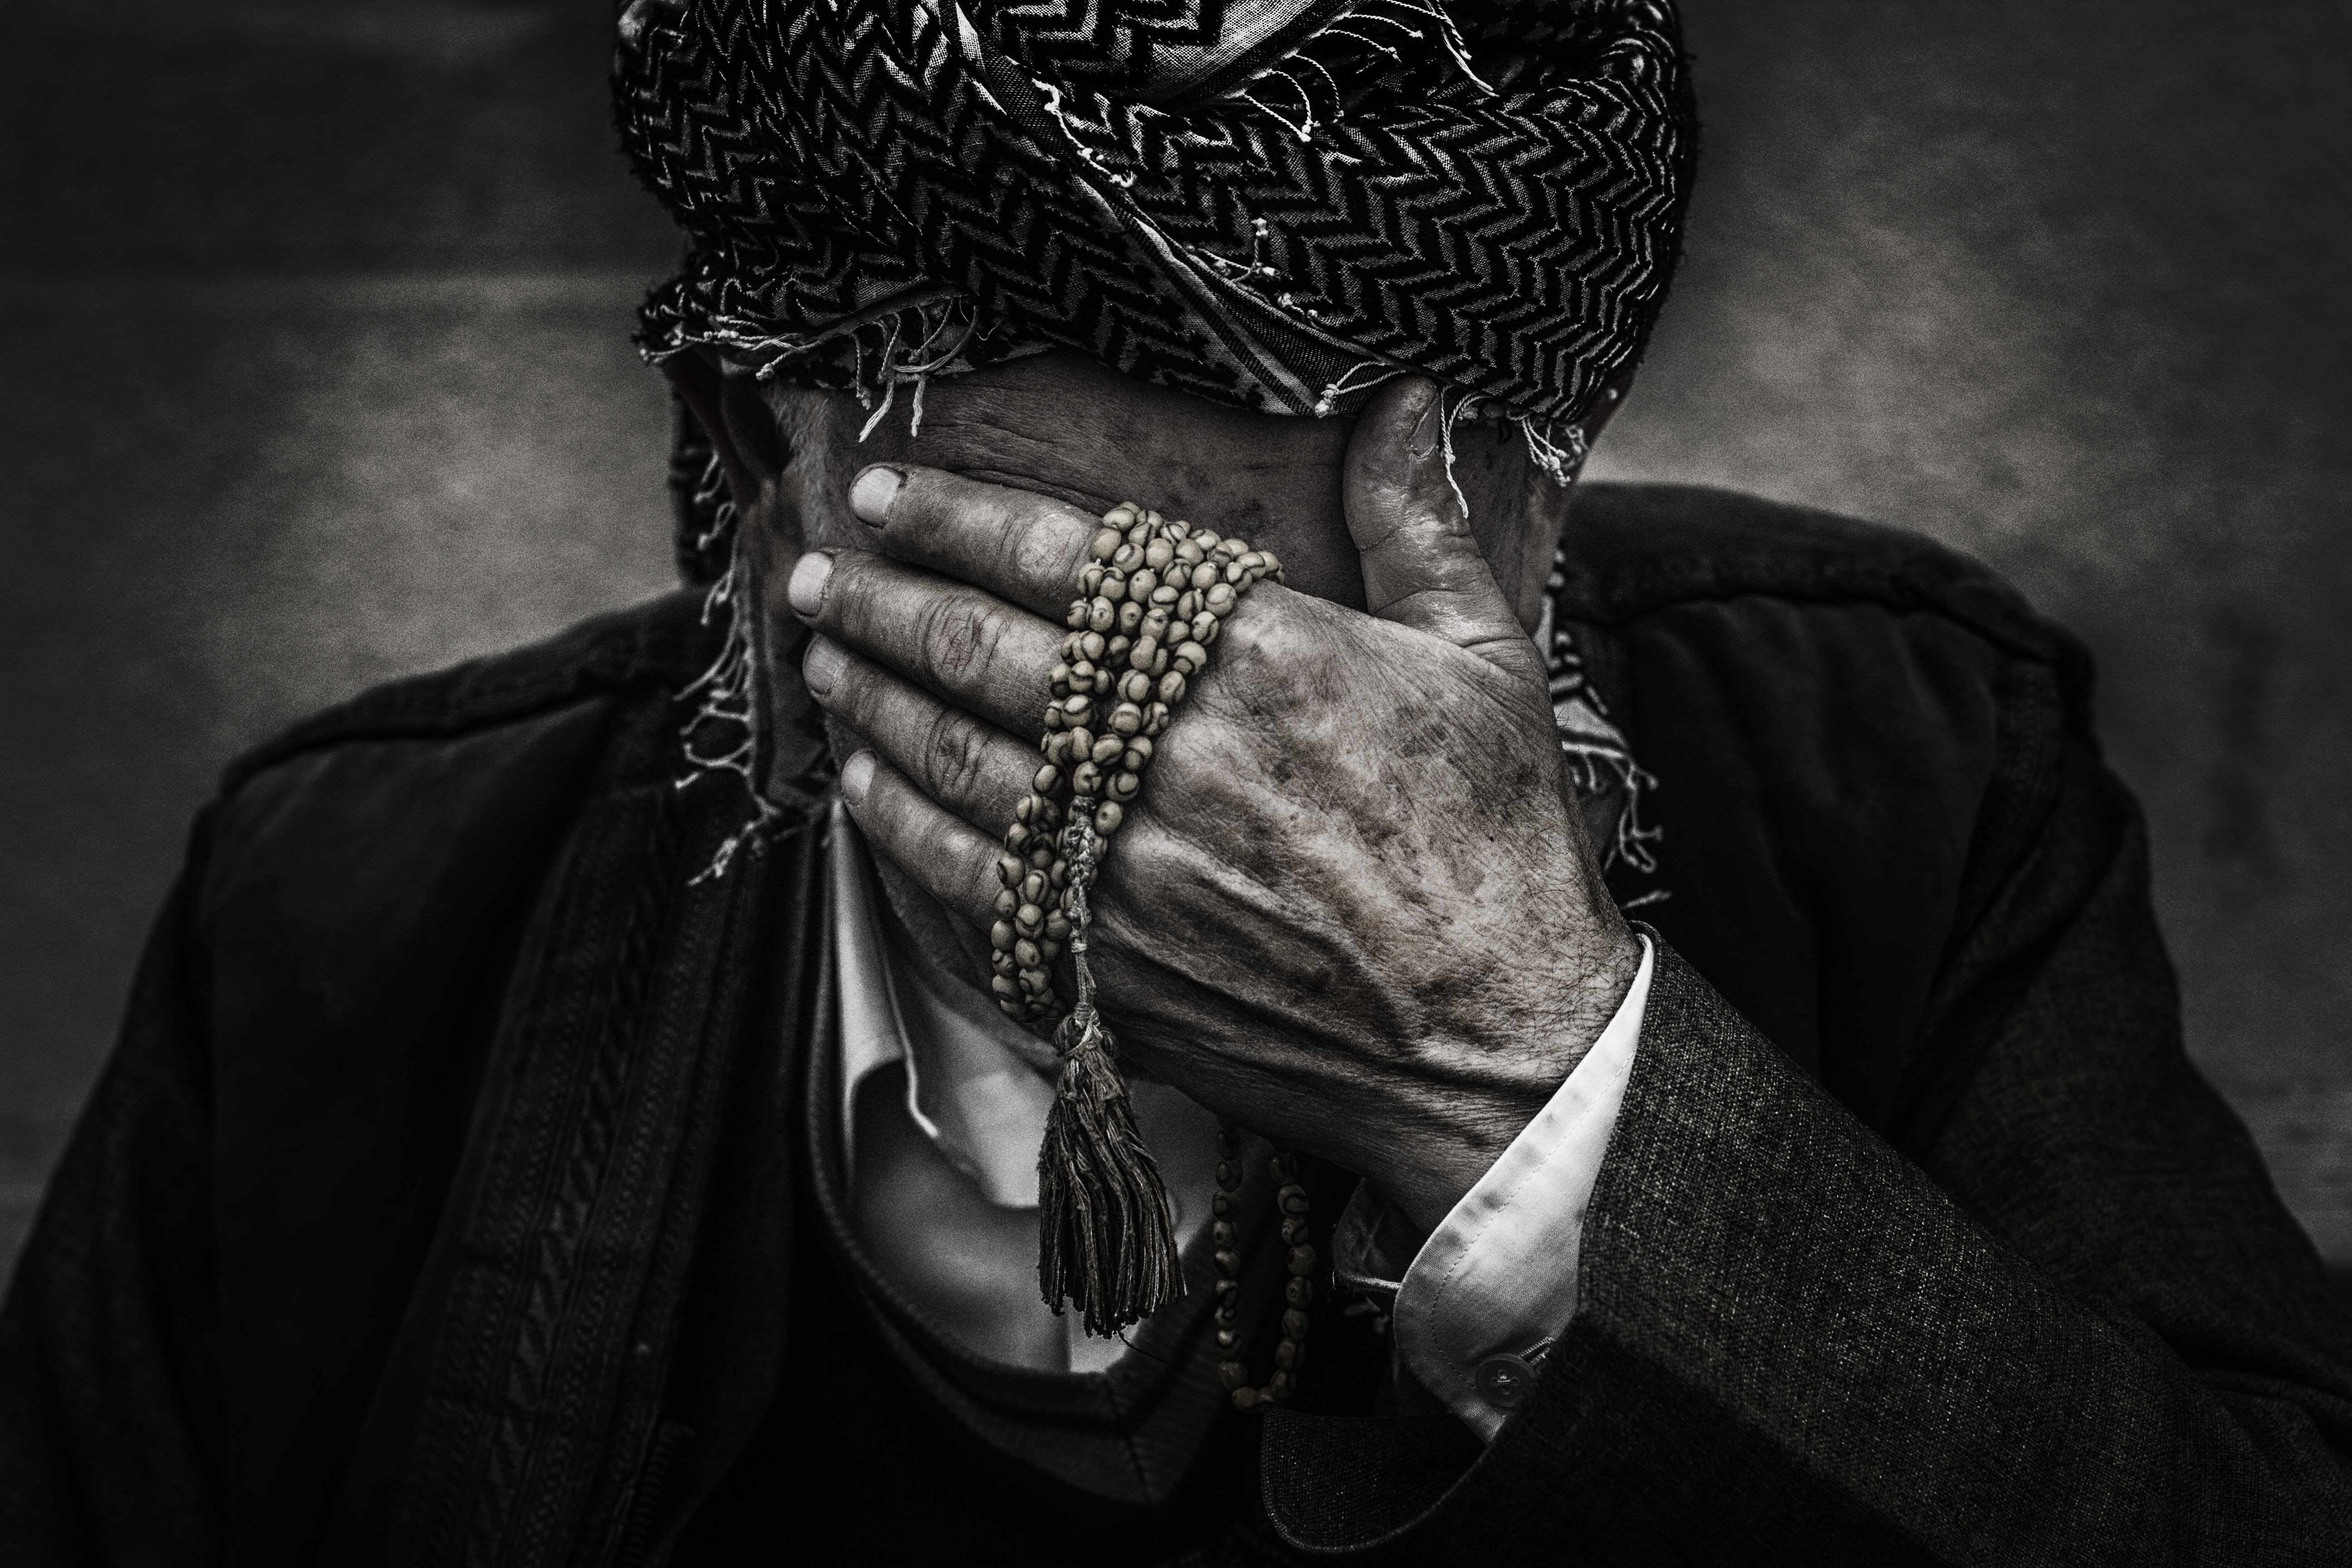 Surmonter la honte - Photo by omar alnahi from Pexels